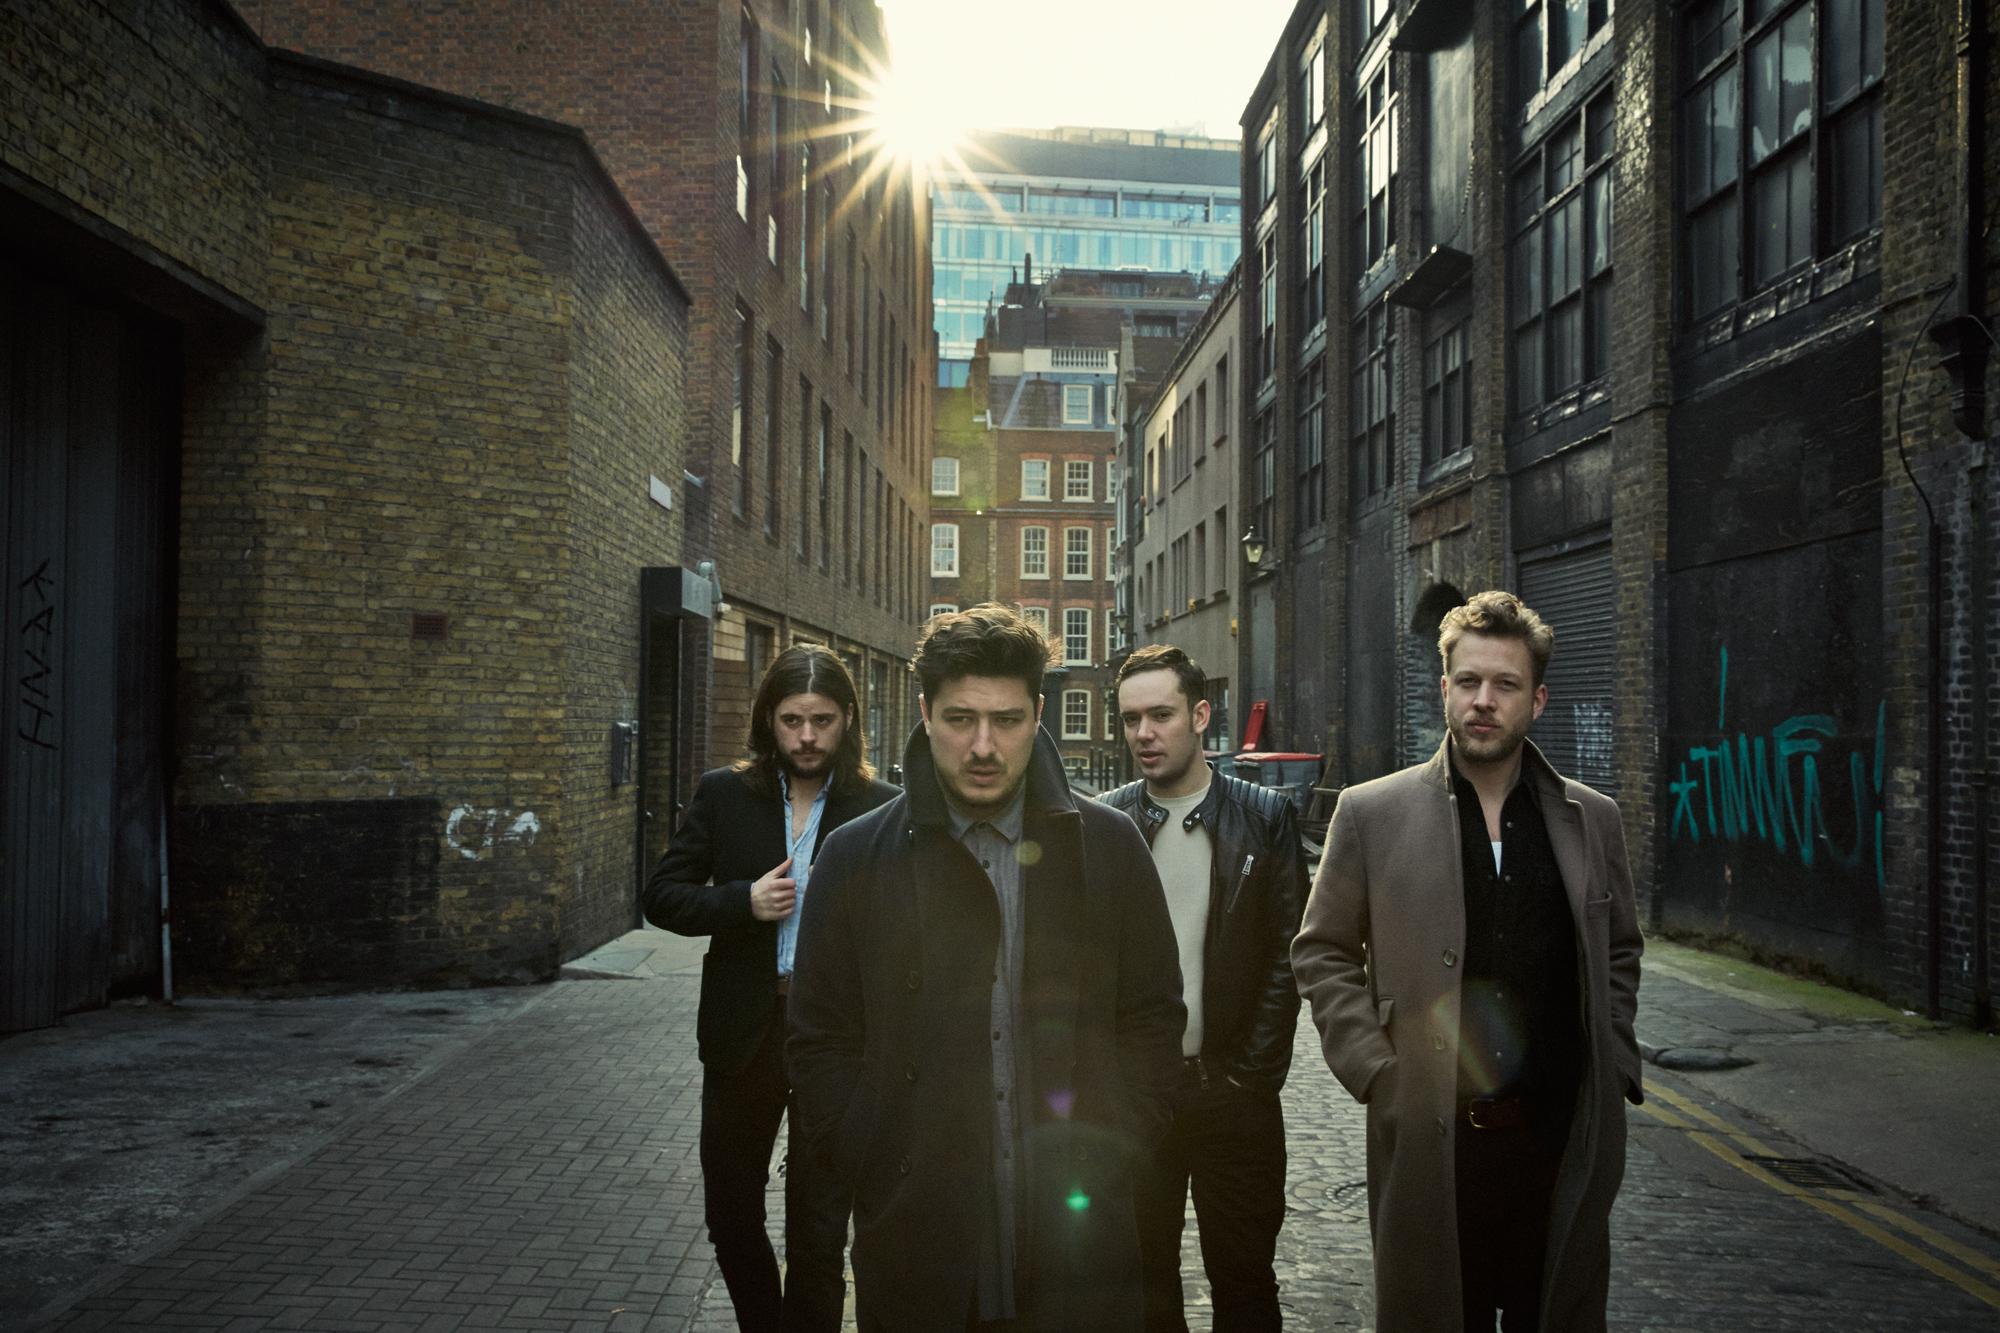 Mumford & Sons Talk Going Electric on New Album 'Wilder Mind'